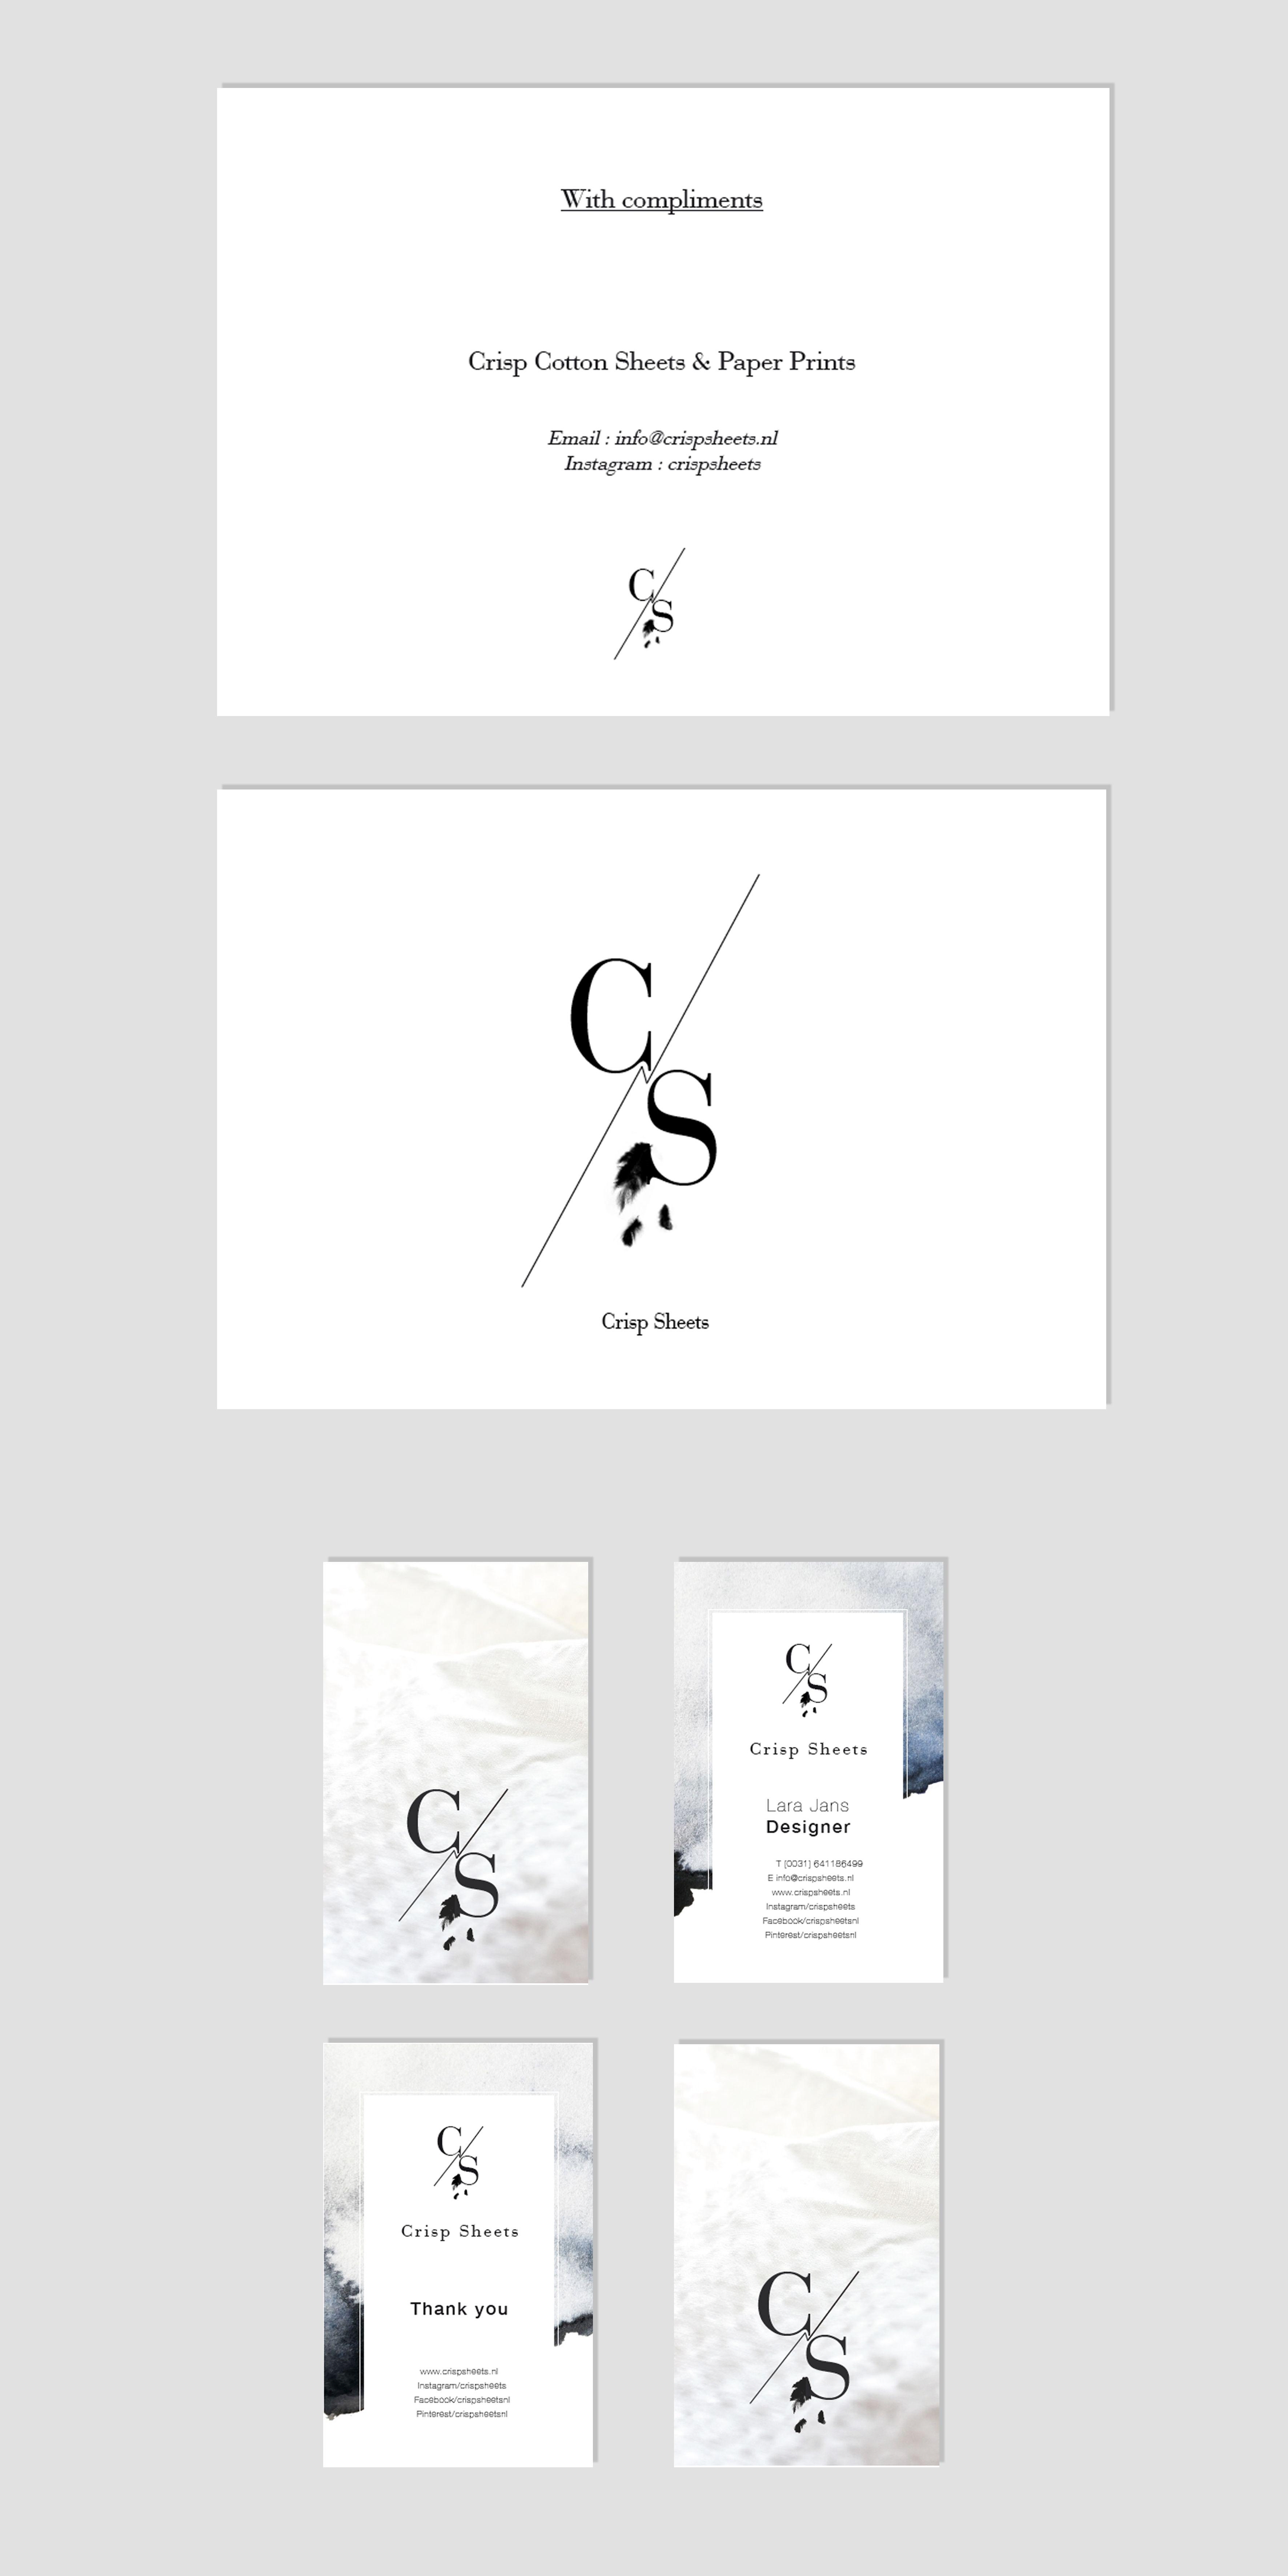 Logo Branding Packaging Business Card Thank You Card Aquarelle Crisp Sheets Name Card Design Colorful Business Card Thank You Card Design